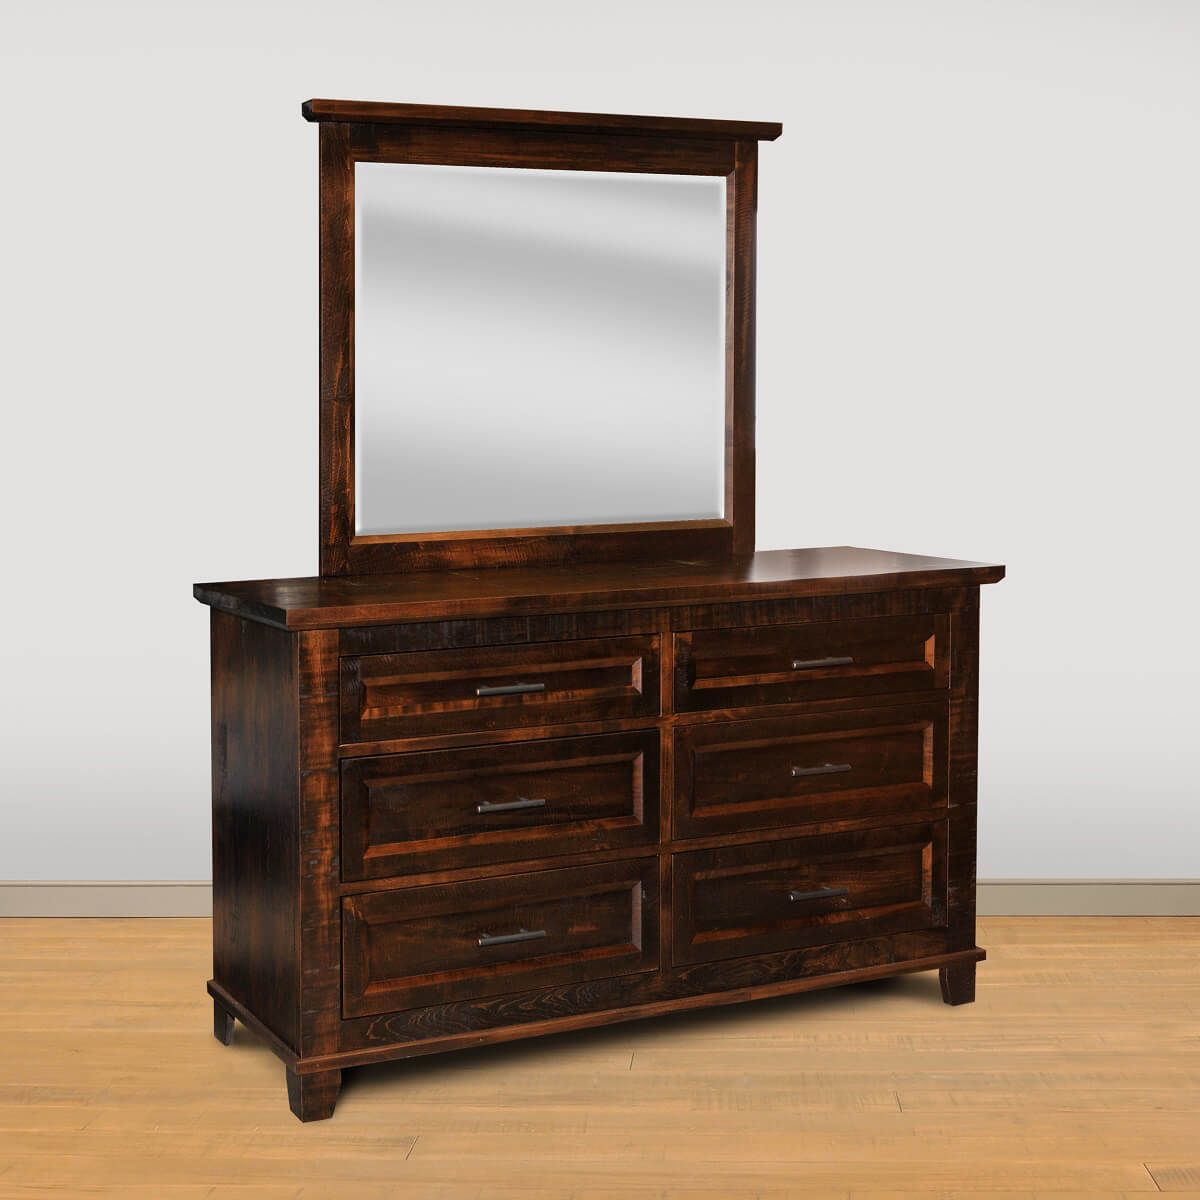 Rough Sawn Dresser and Mirror